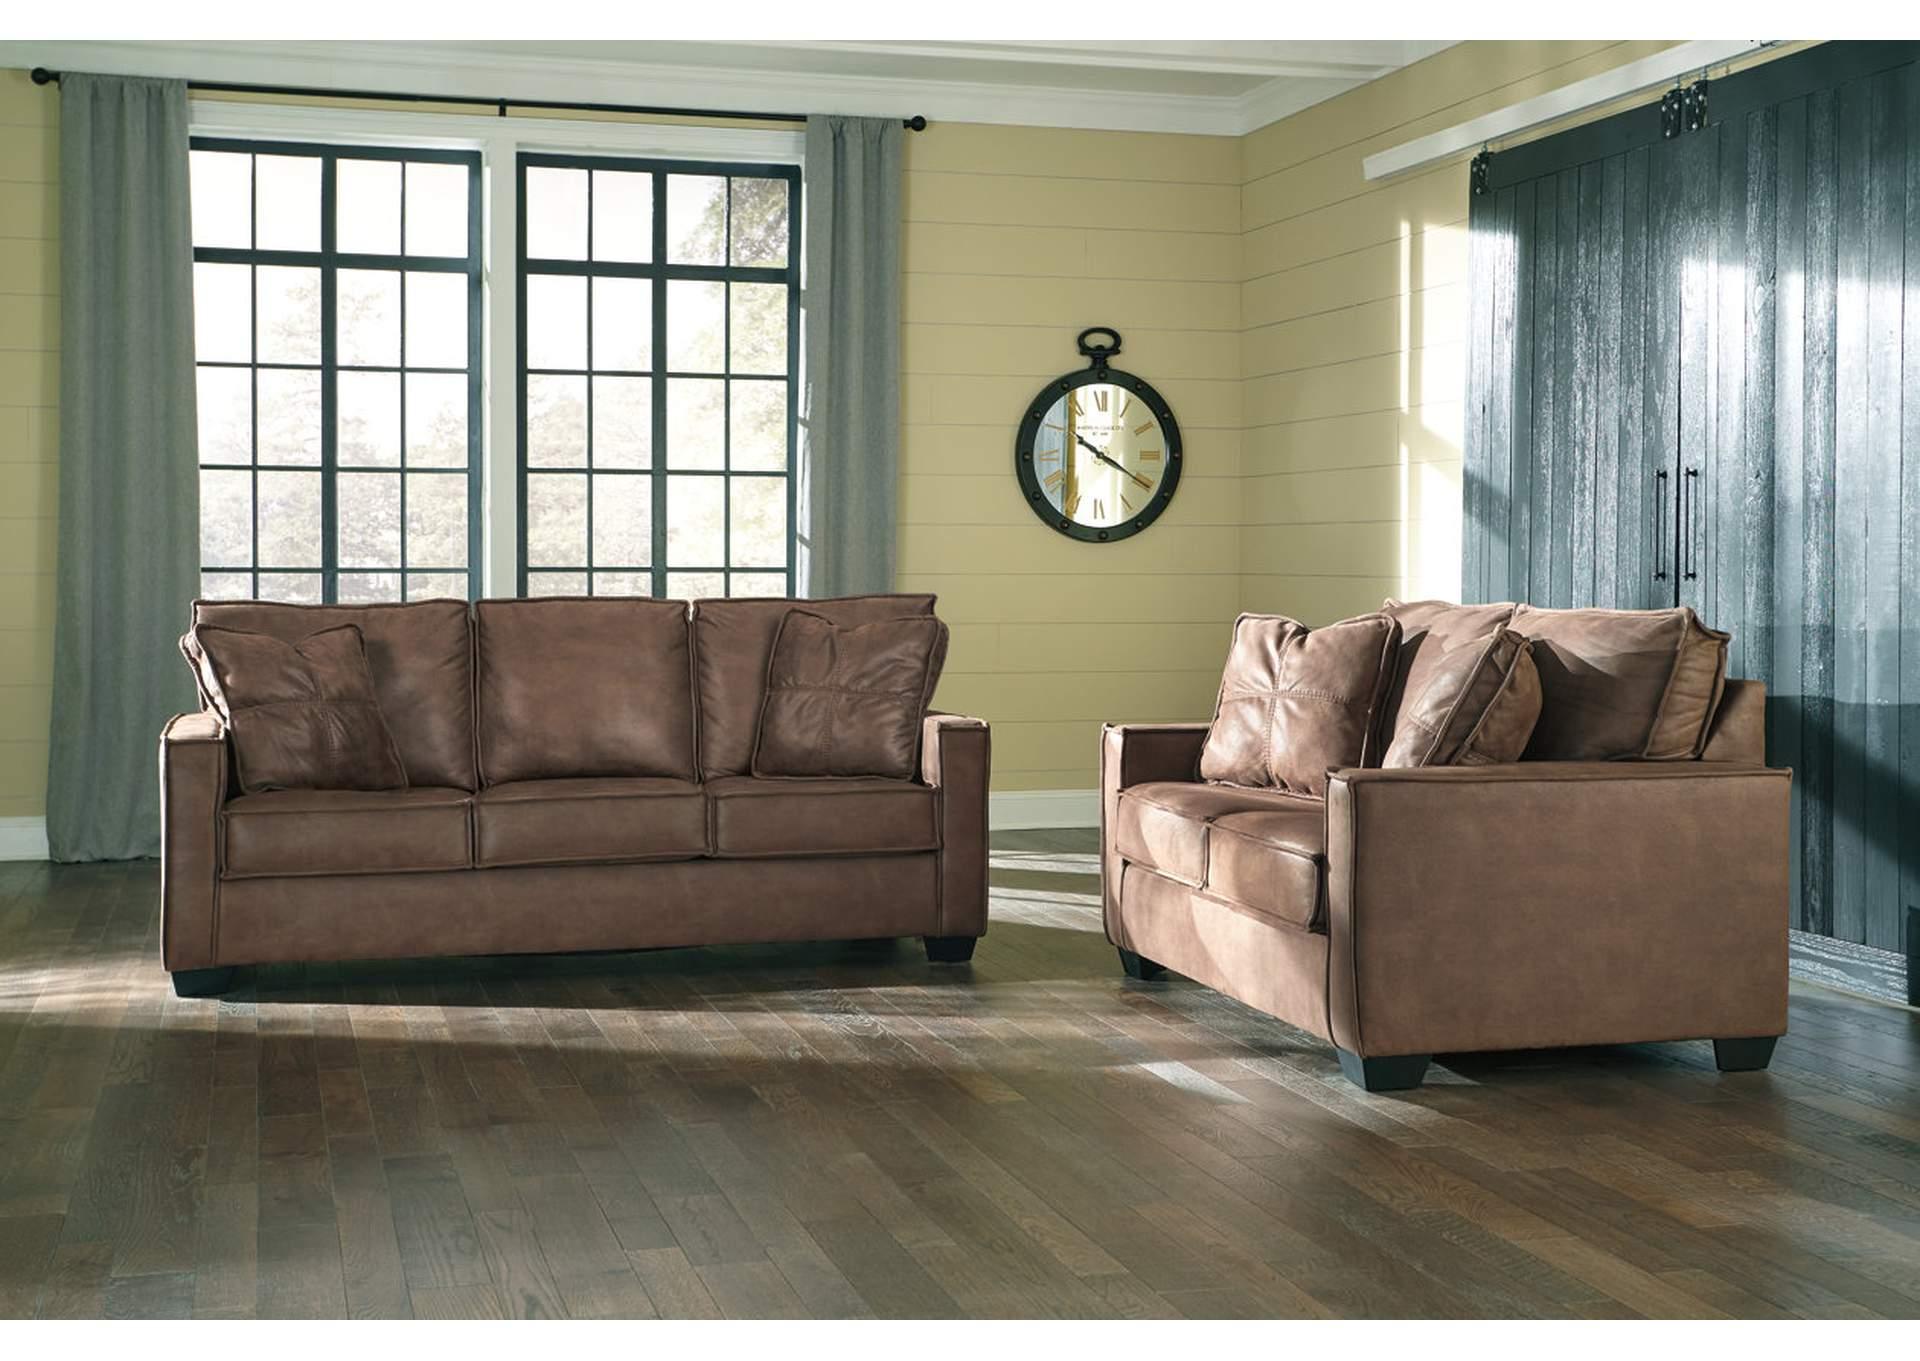 Sensational Royal Furniture Terrington Harness Sofa And Loveseat Interior Design Ideas Gentotryabchikinfo